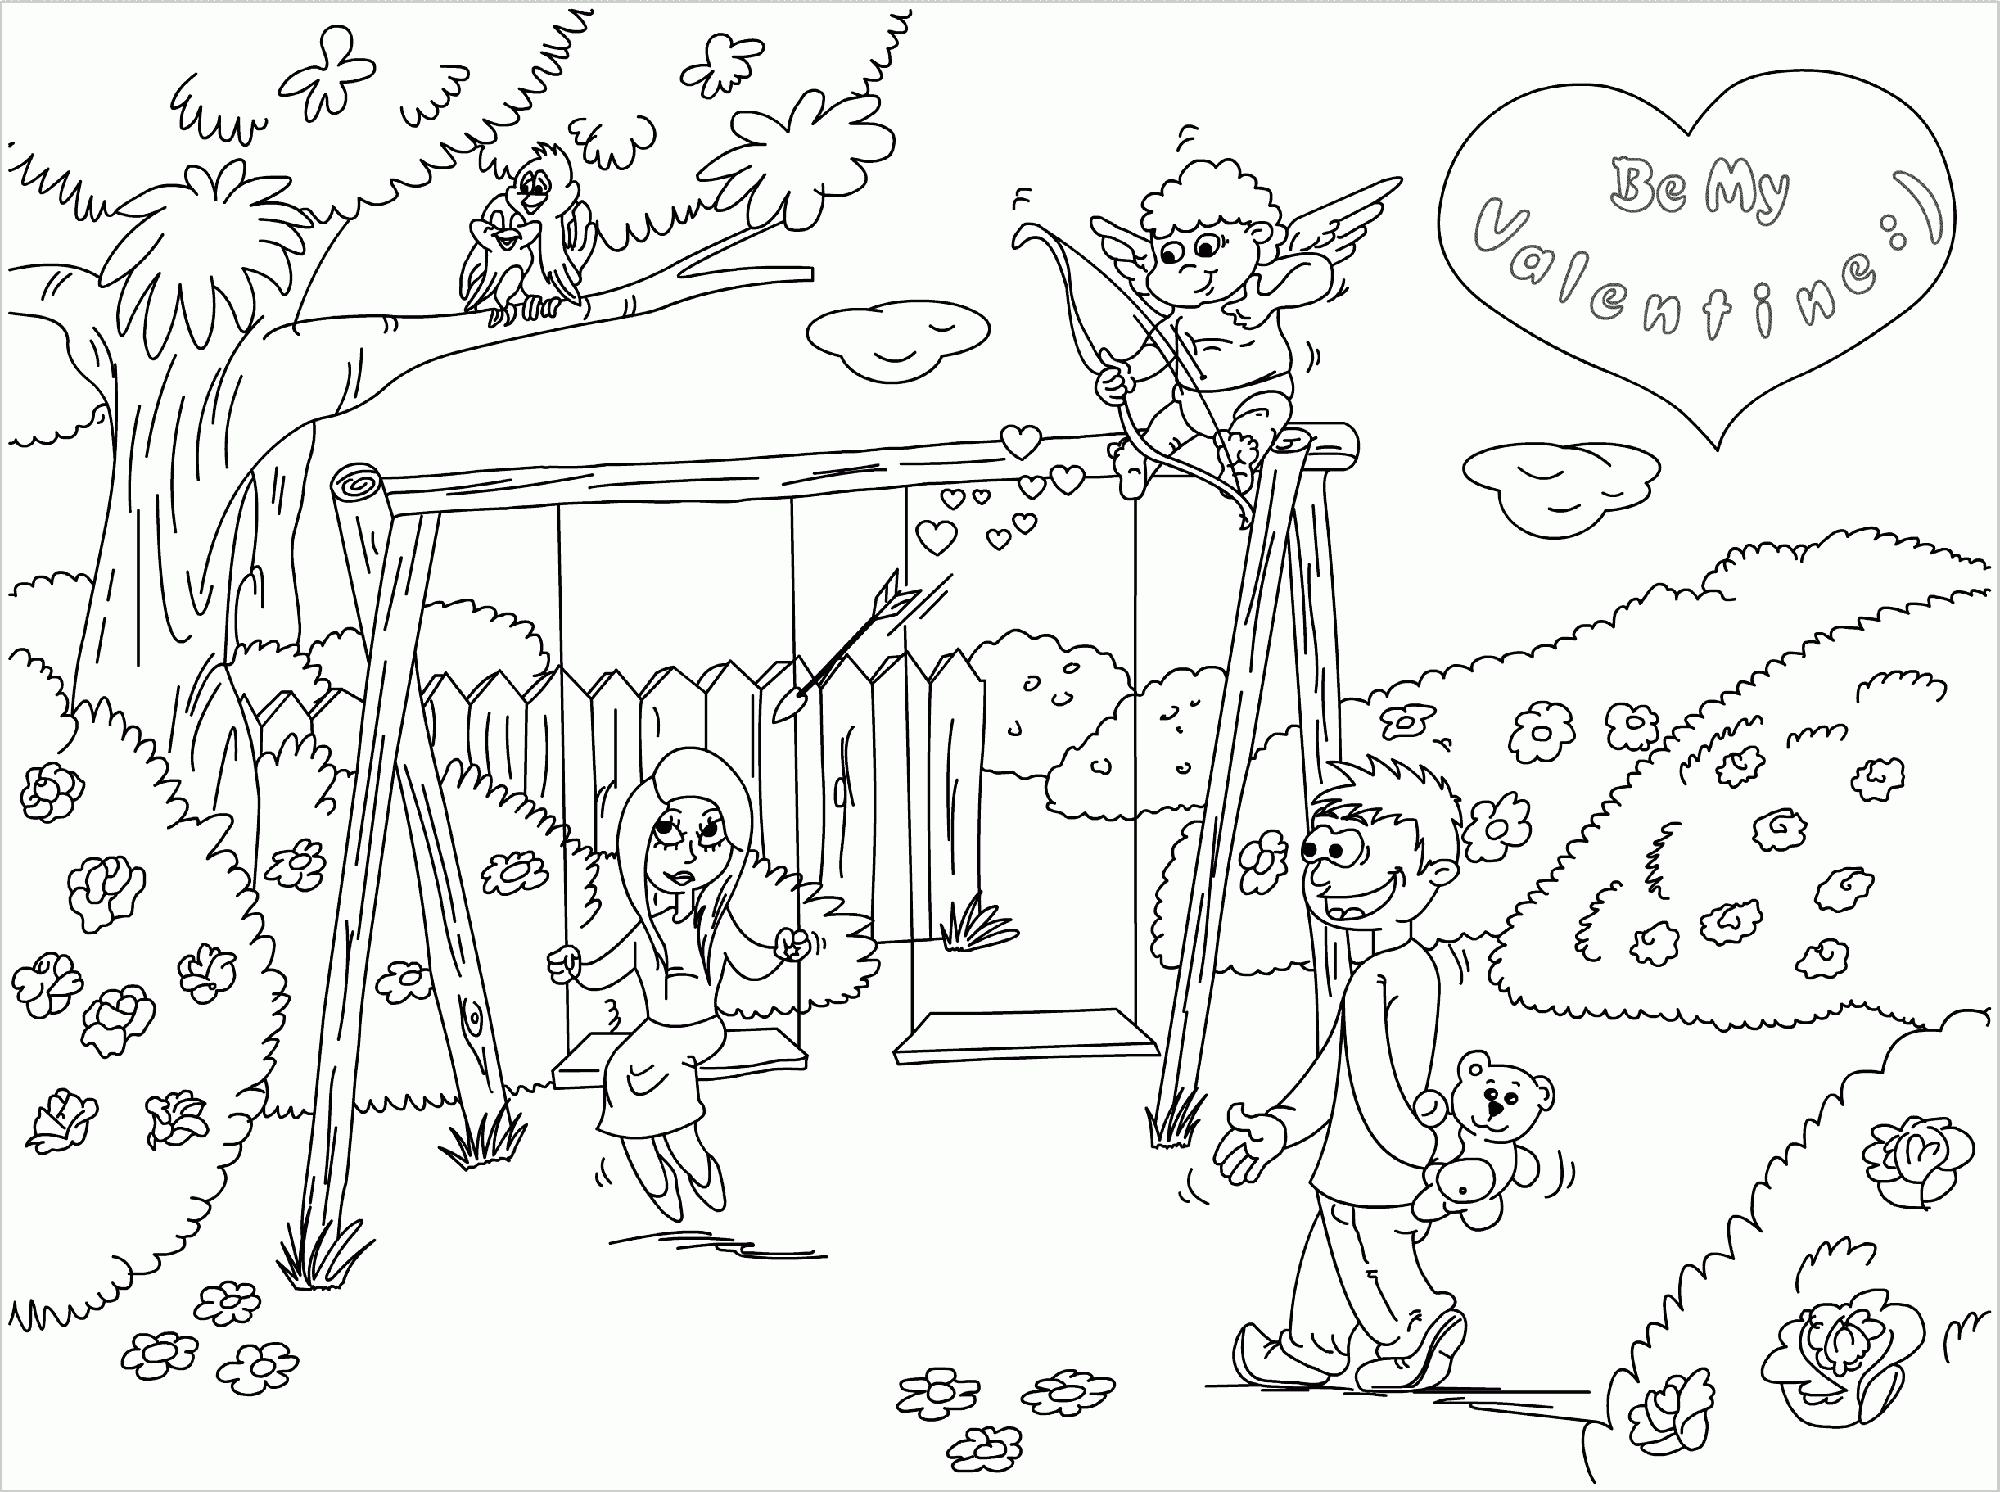 2000x1492 Drawn Scenery Park Playground